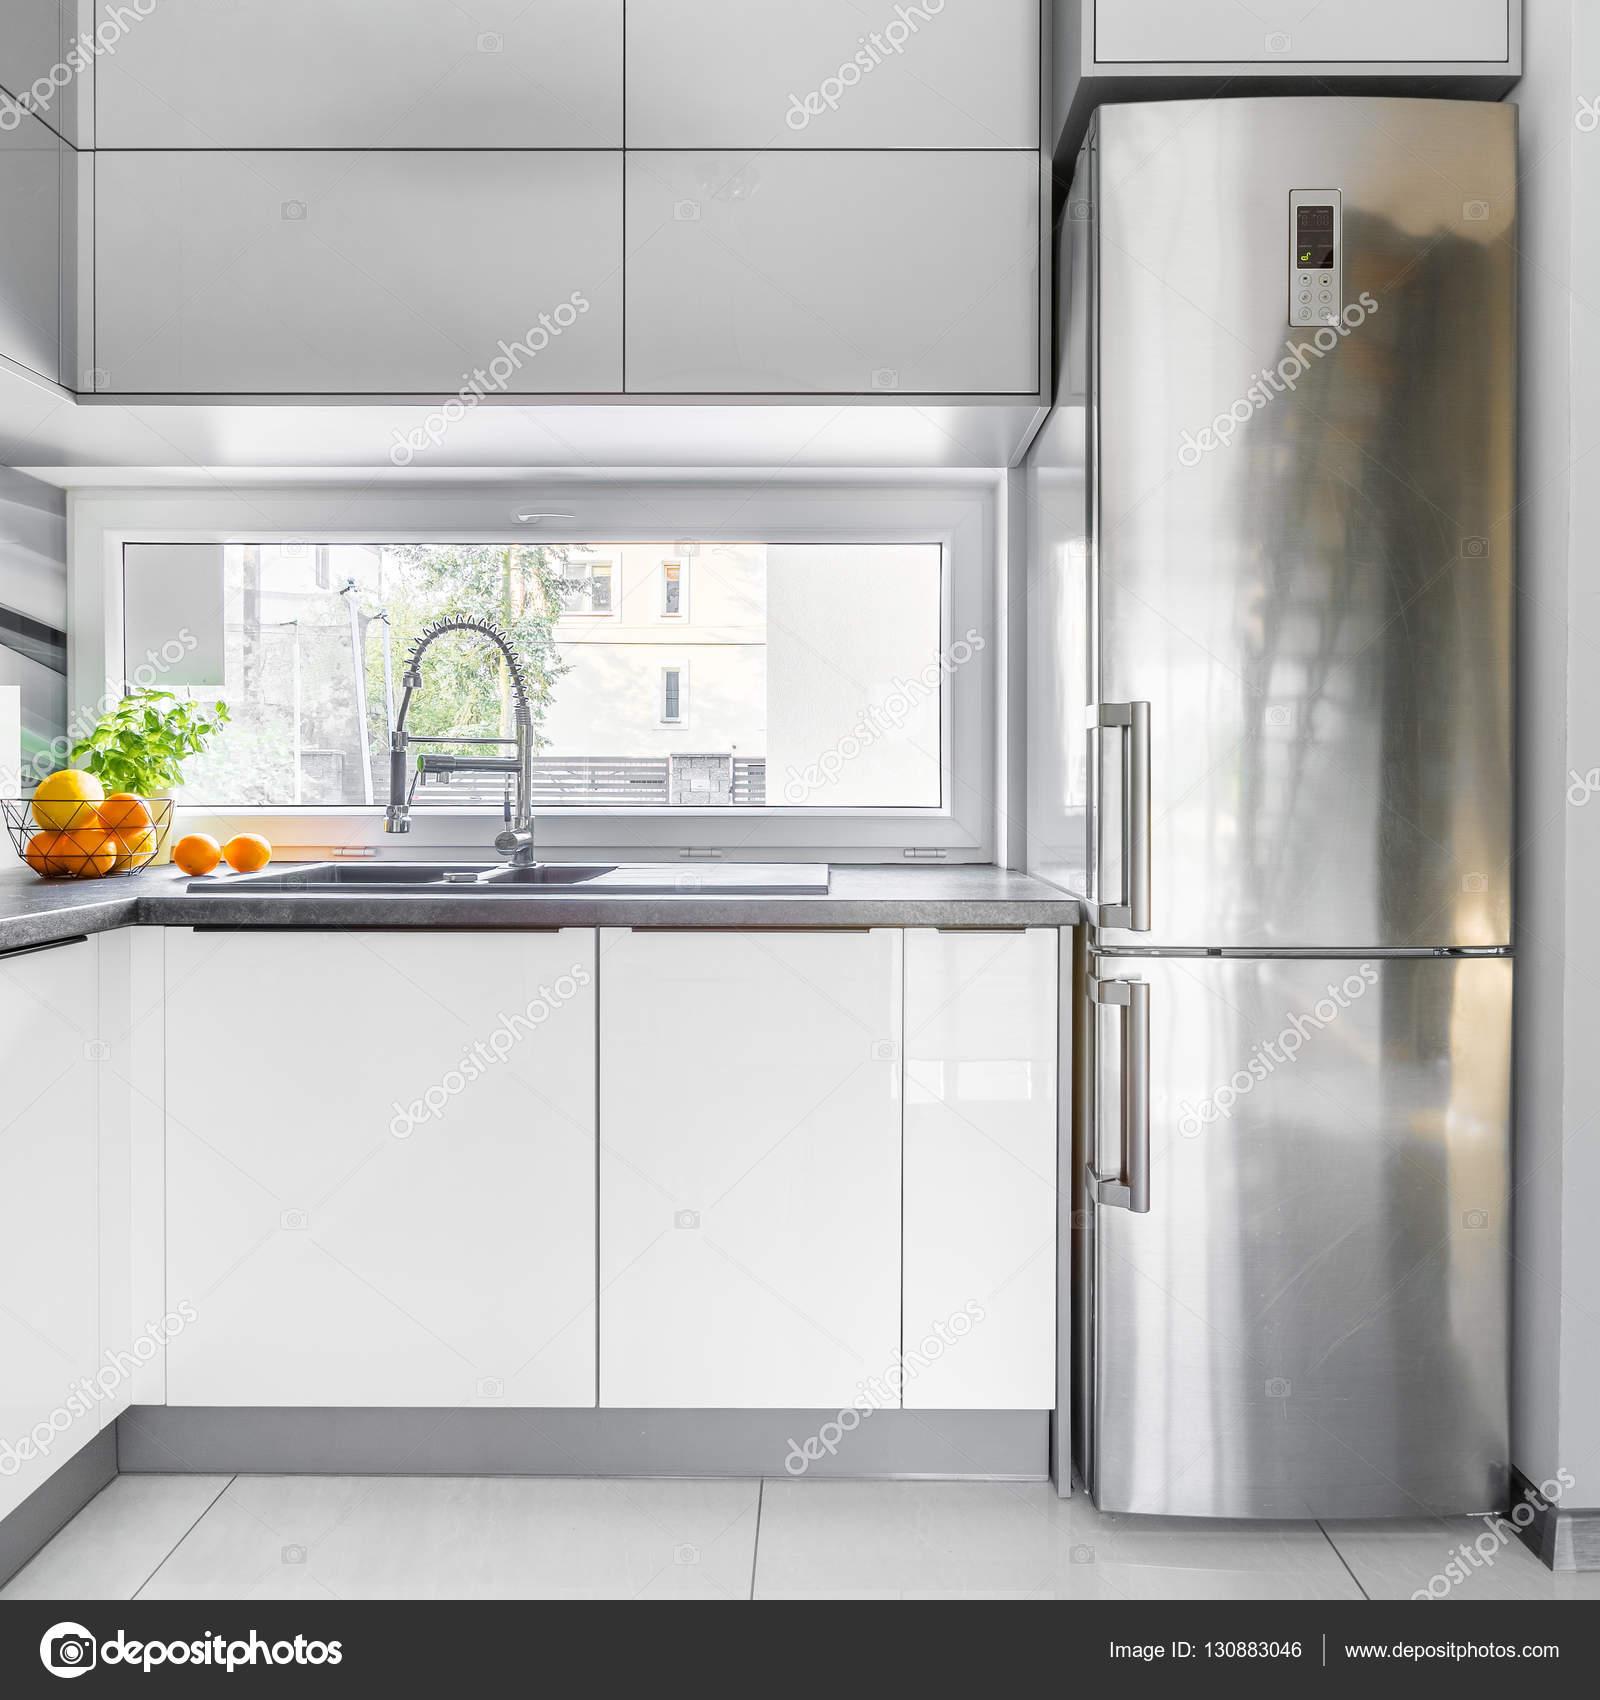 Cucina villa bianca con finestra foto stock in4mal for Cucina moderna con finestra